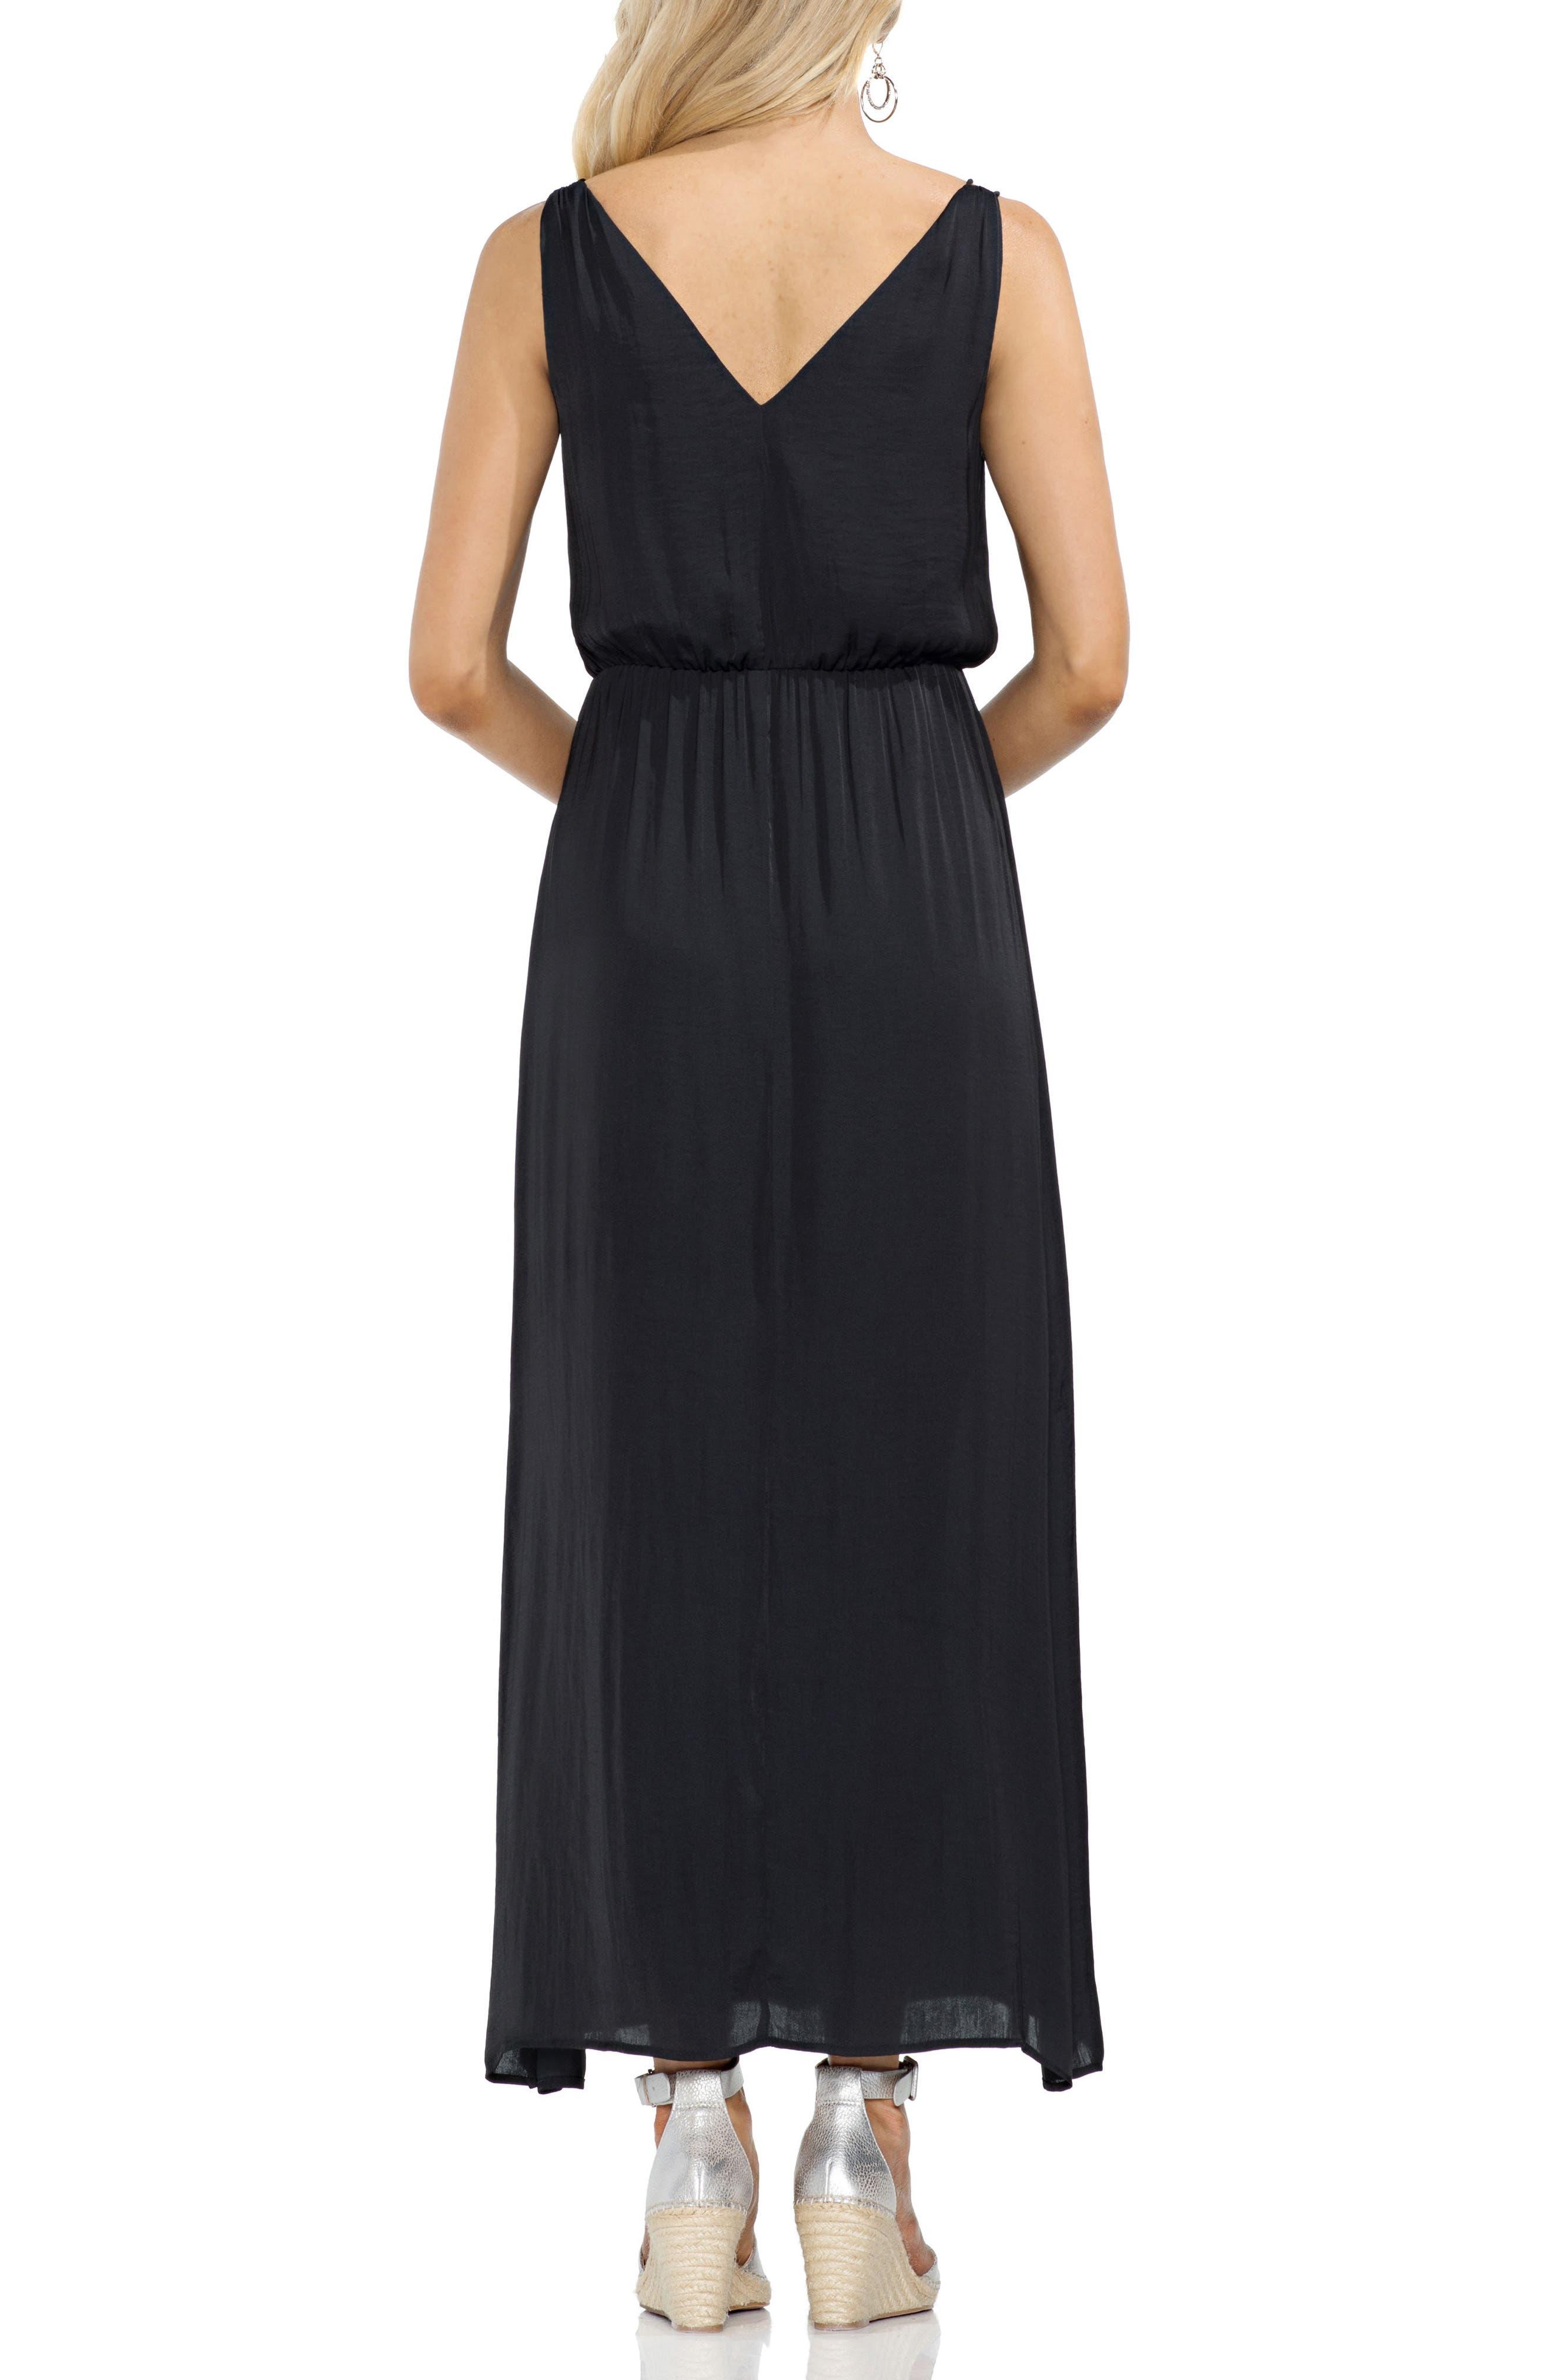 Rumple Satin Blouson Midi Dress,                             Alternate thumbnail 2, color,                             Rich Black